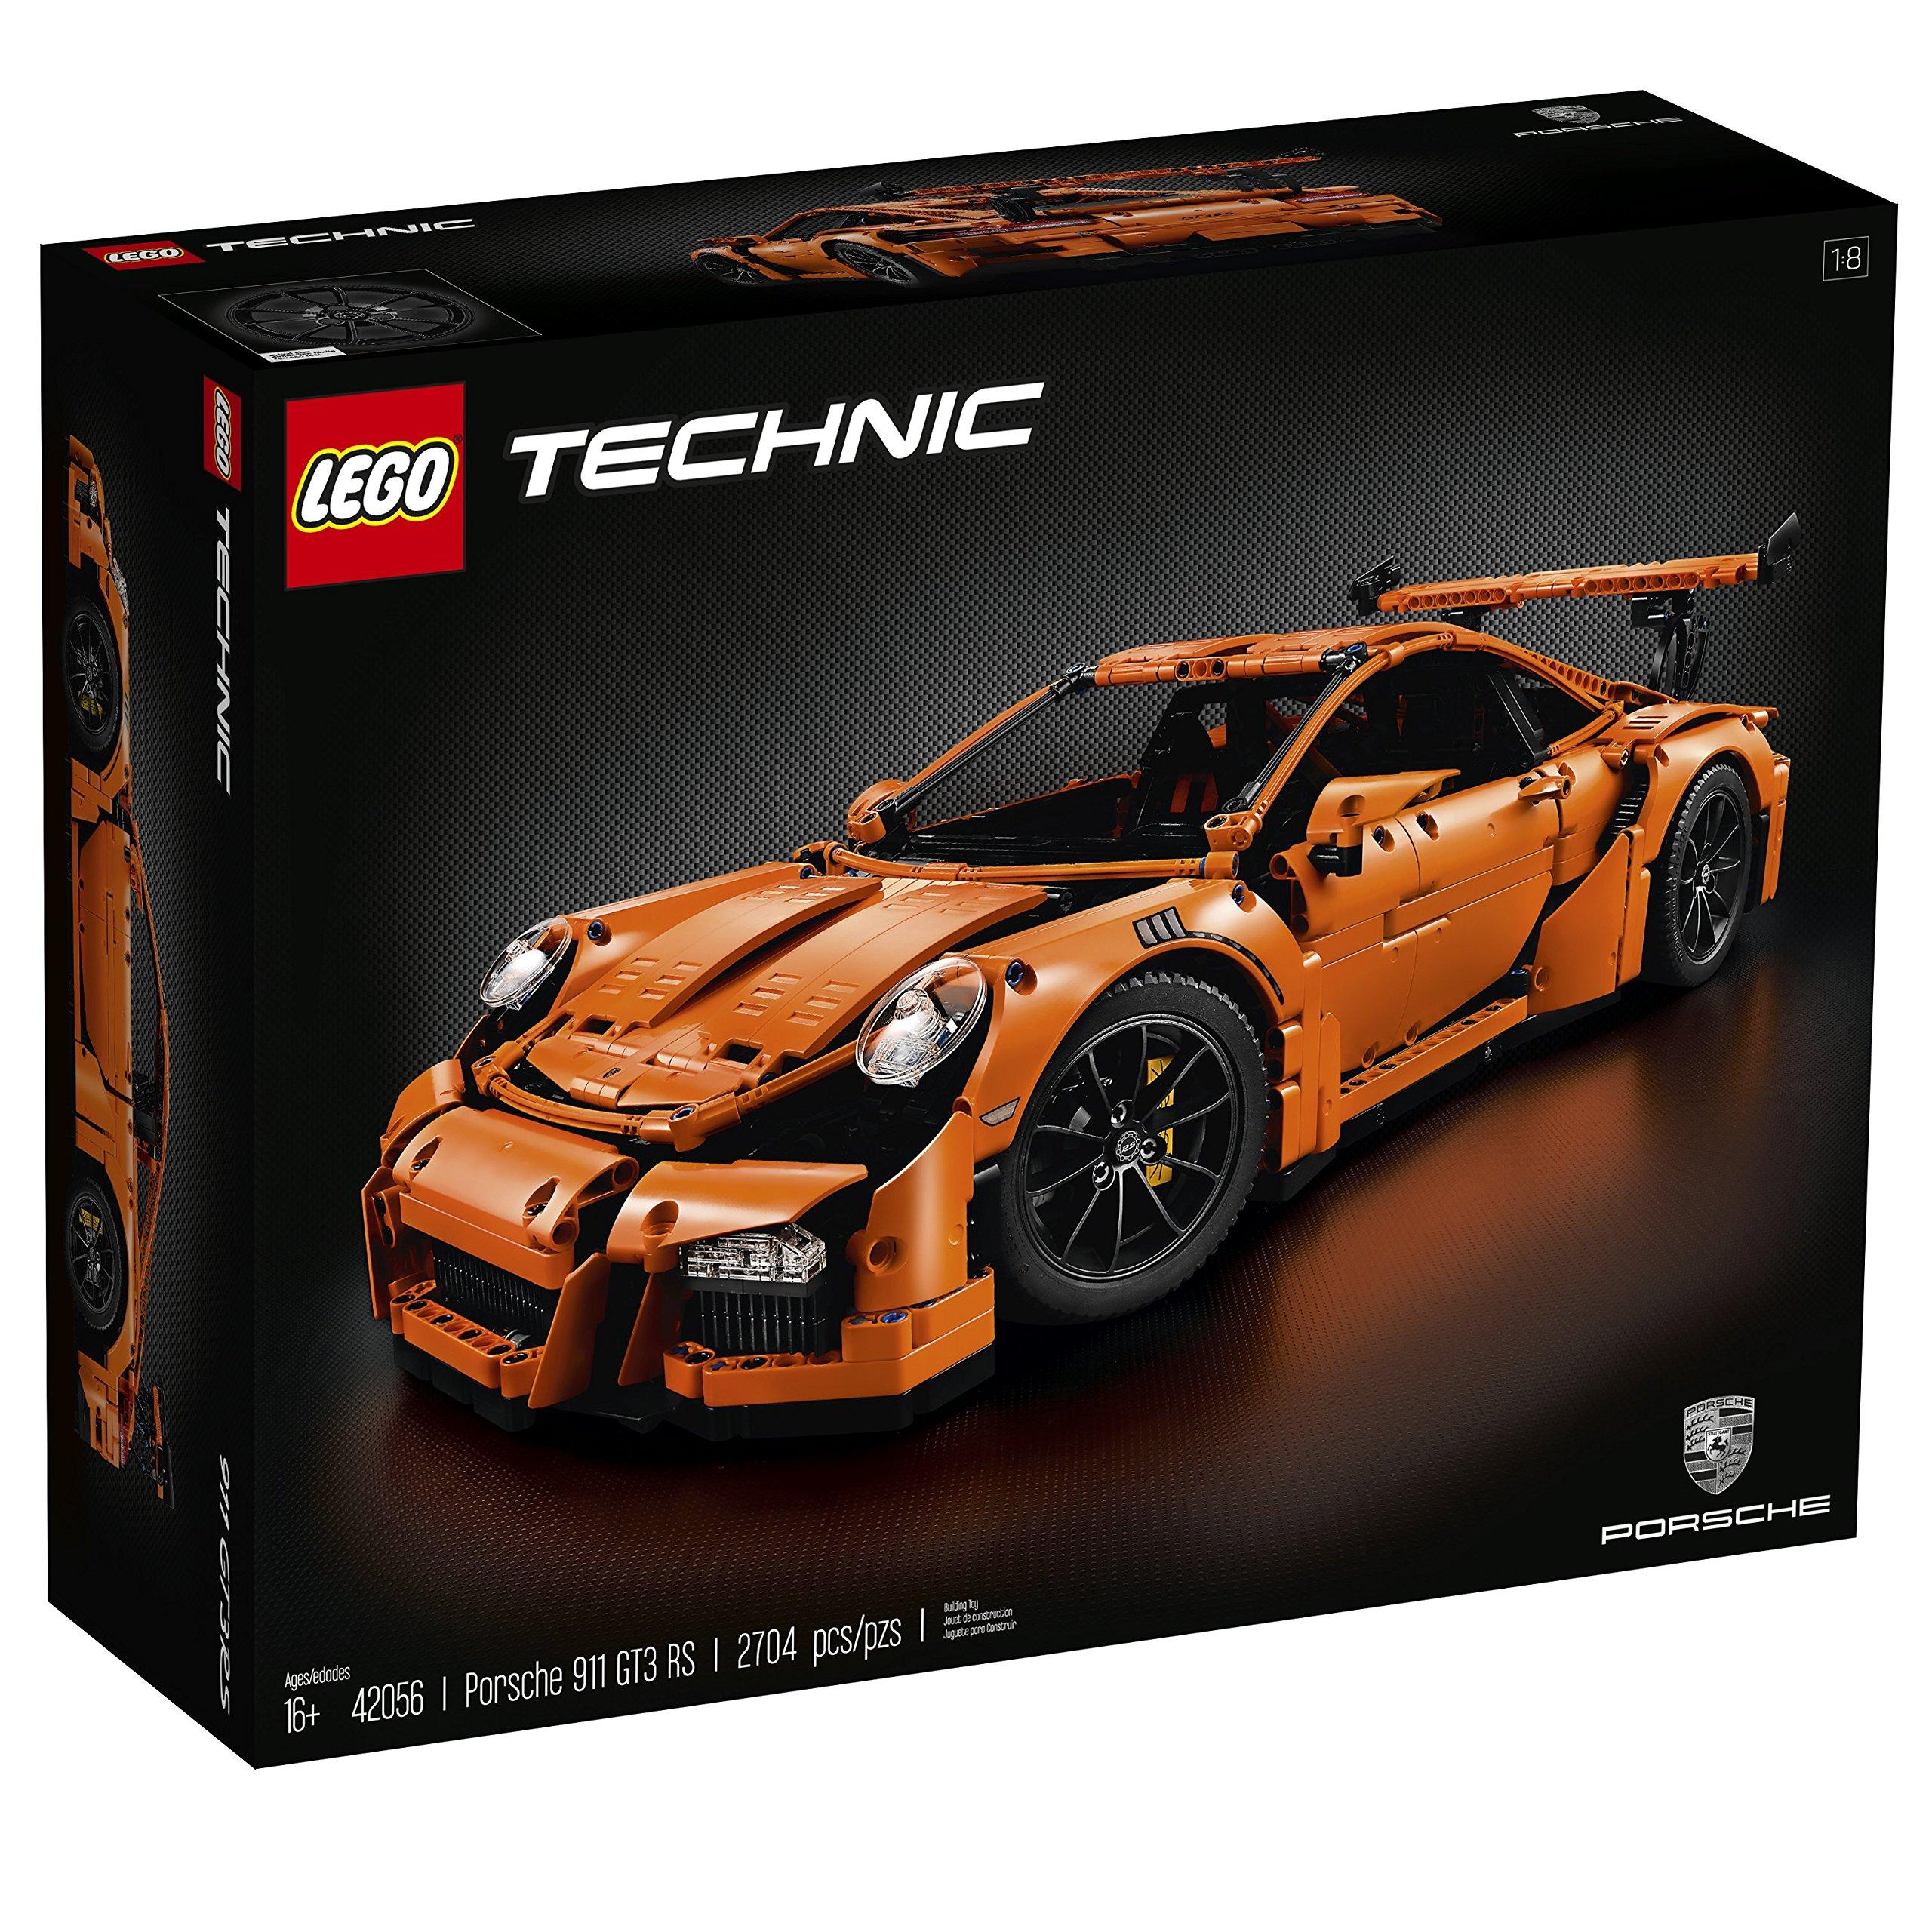 Lego Technic Porsche 911 Gt3 Rs 42056 14